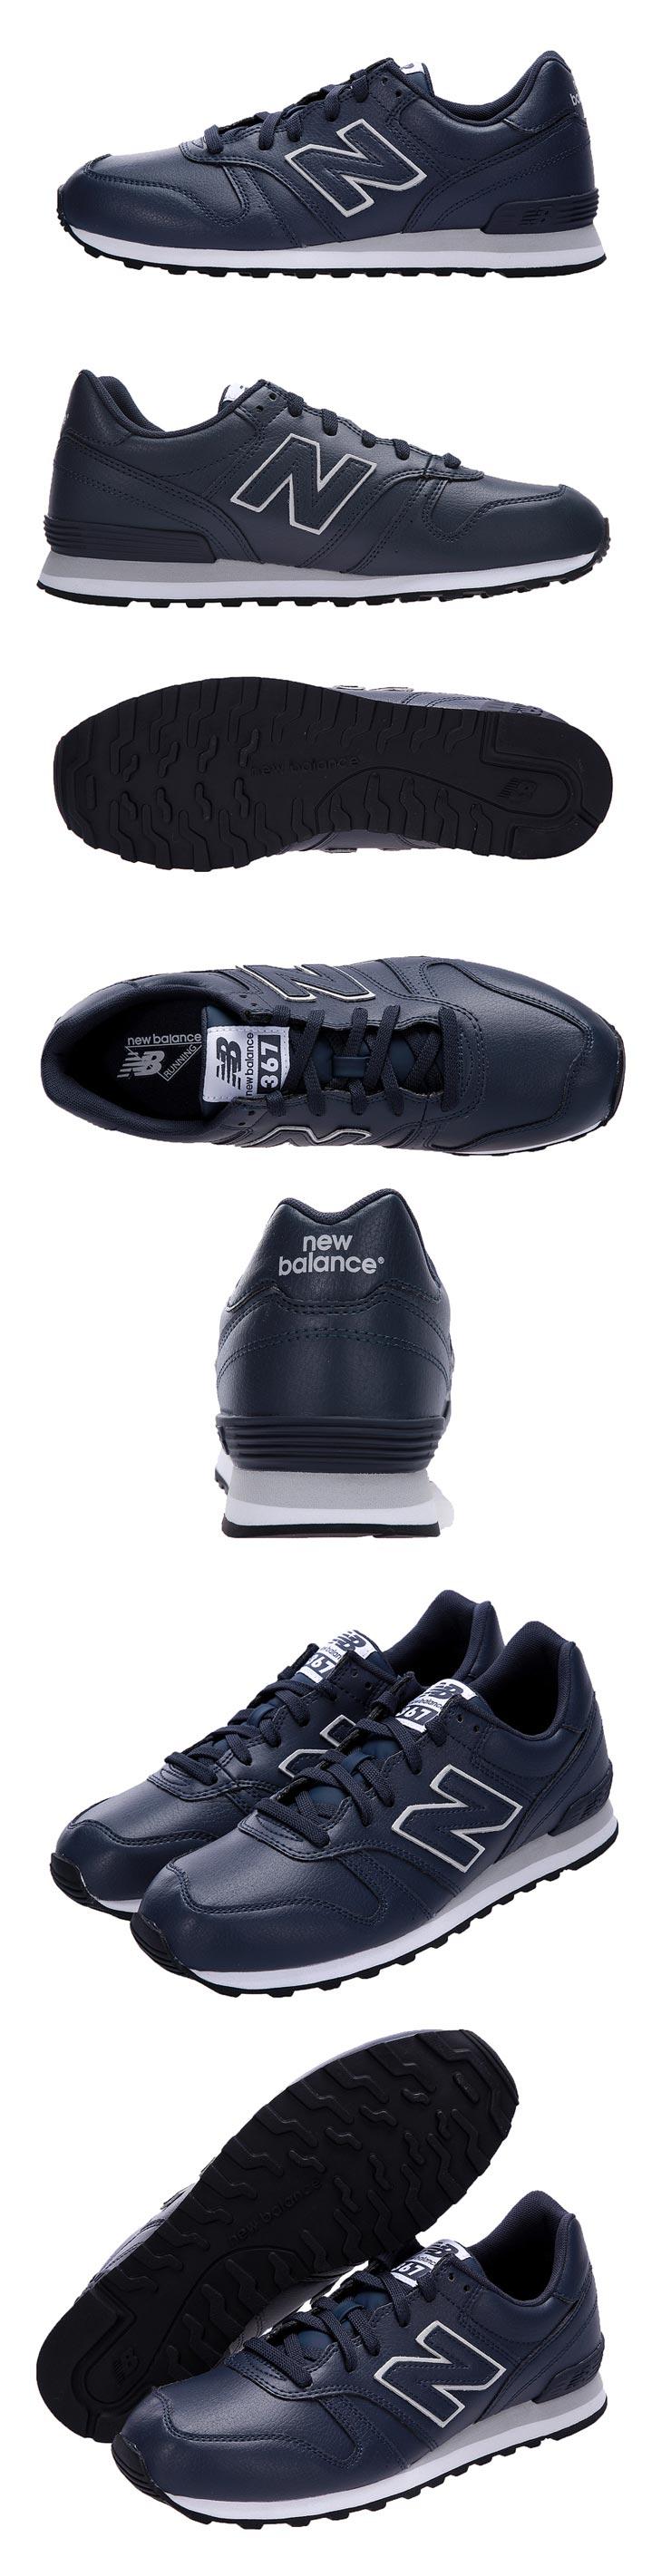 newbalance/新百伦公司新品nb男鞋复古鞋m367lbw0/在